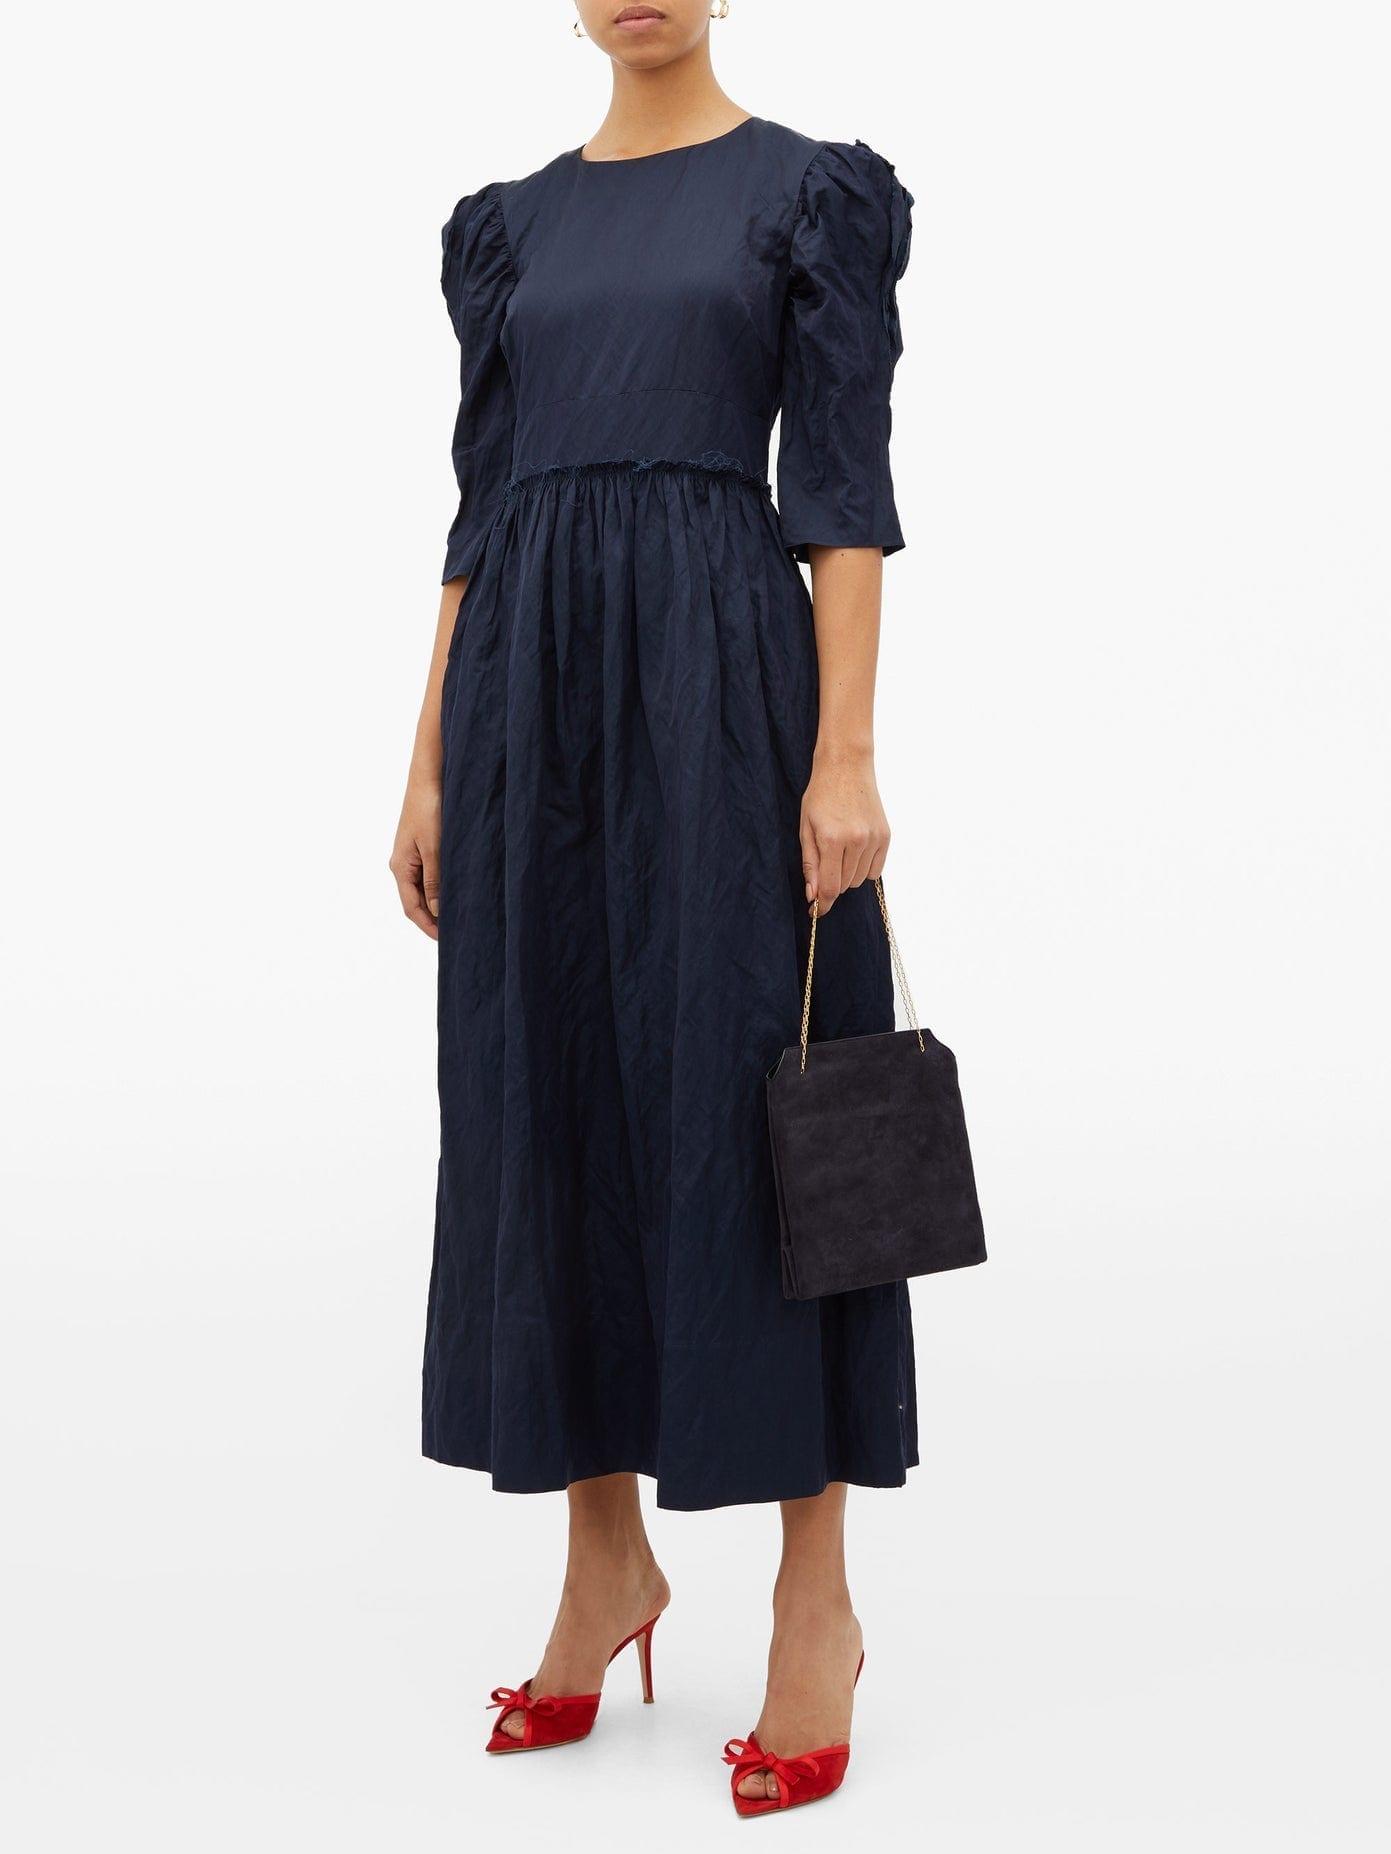 BROCK COLLECTION Puffed-sleeve Twill Dress